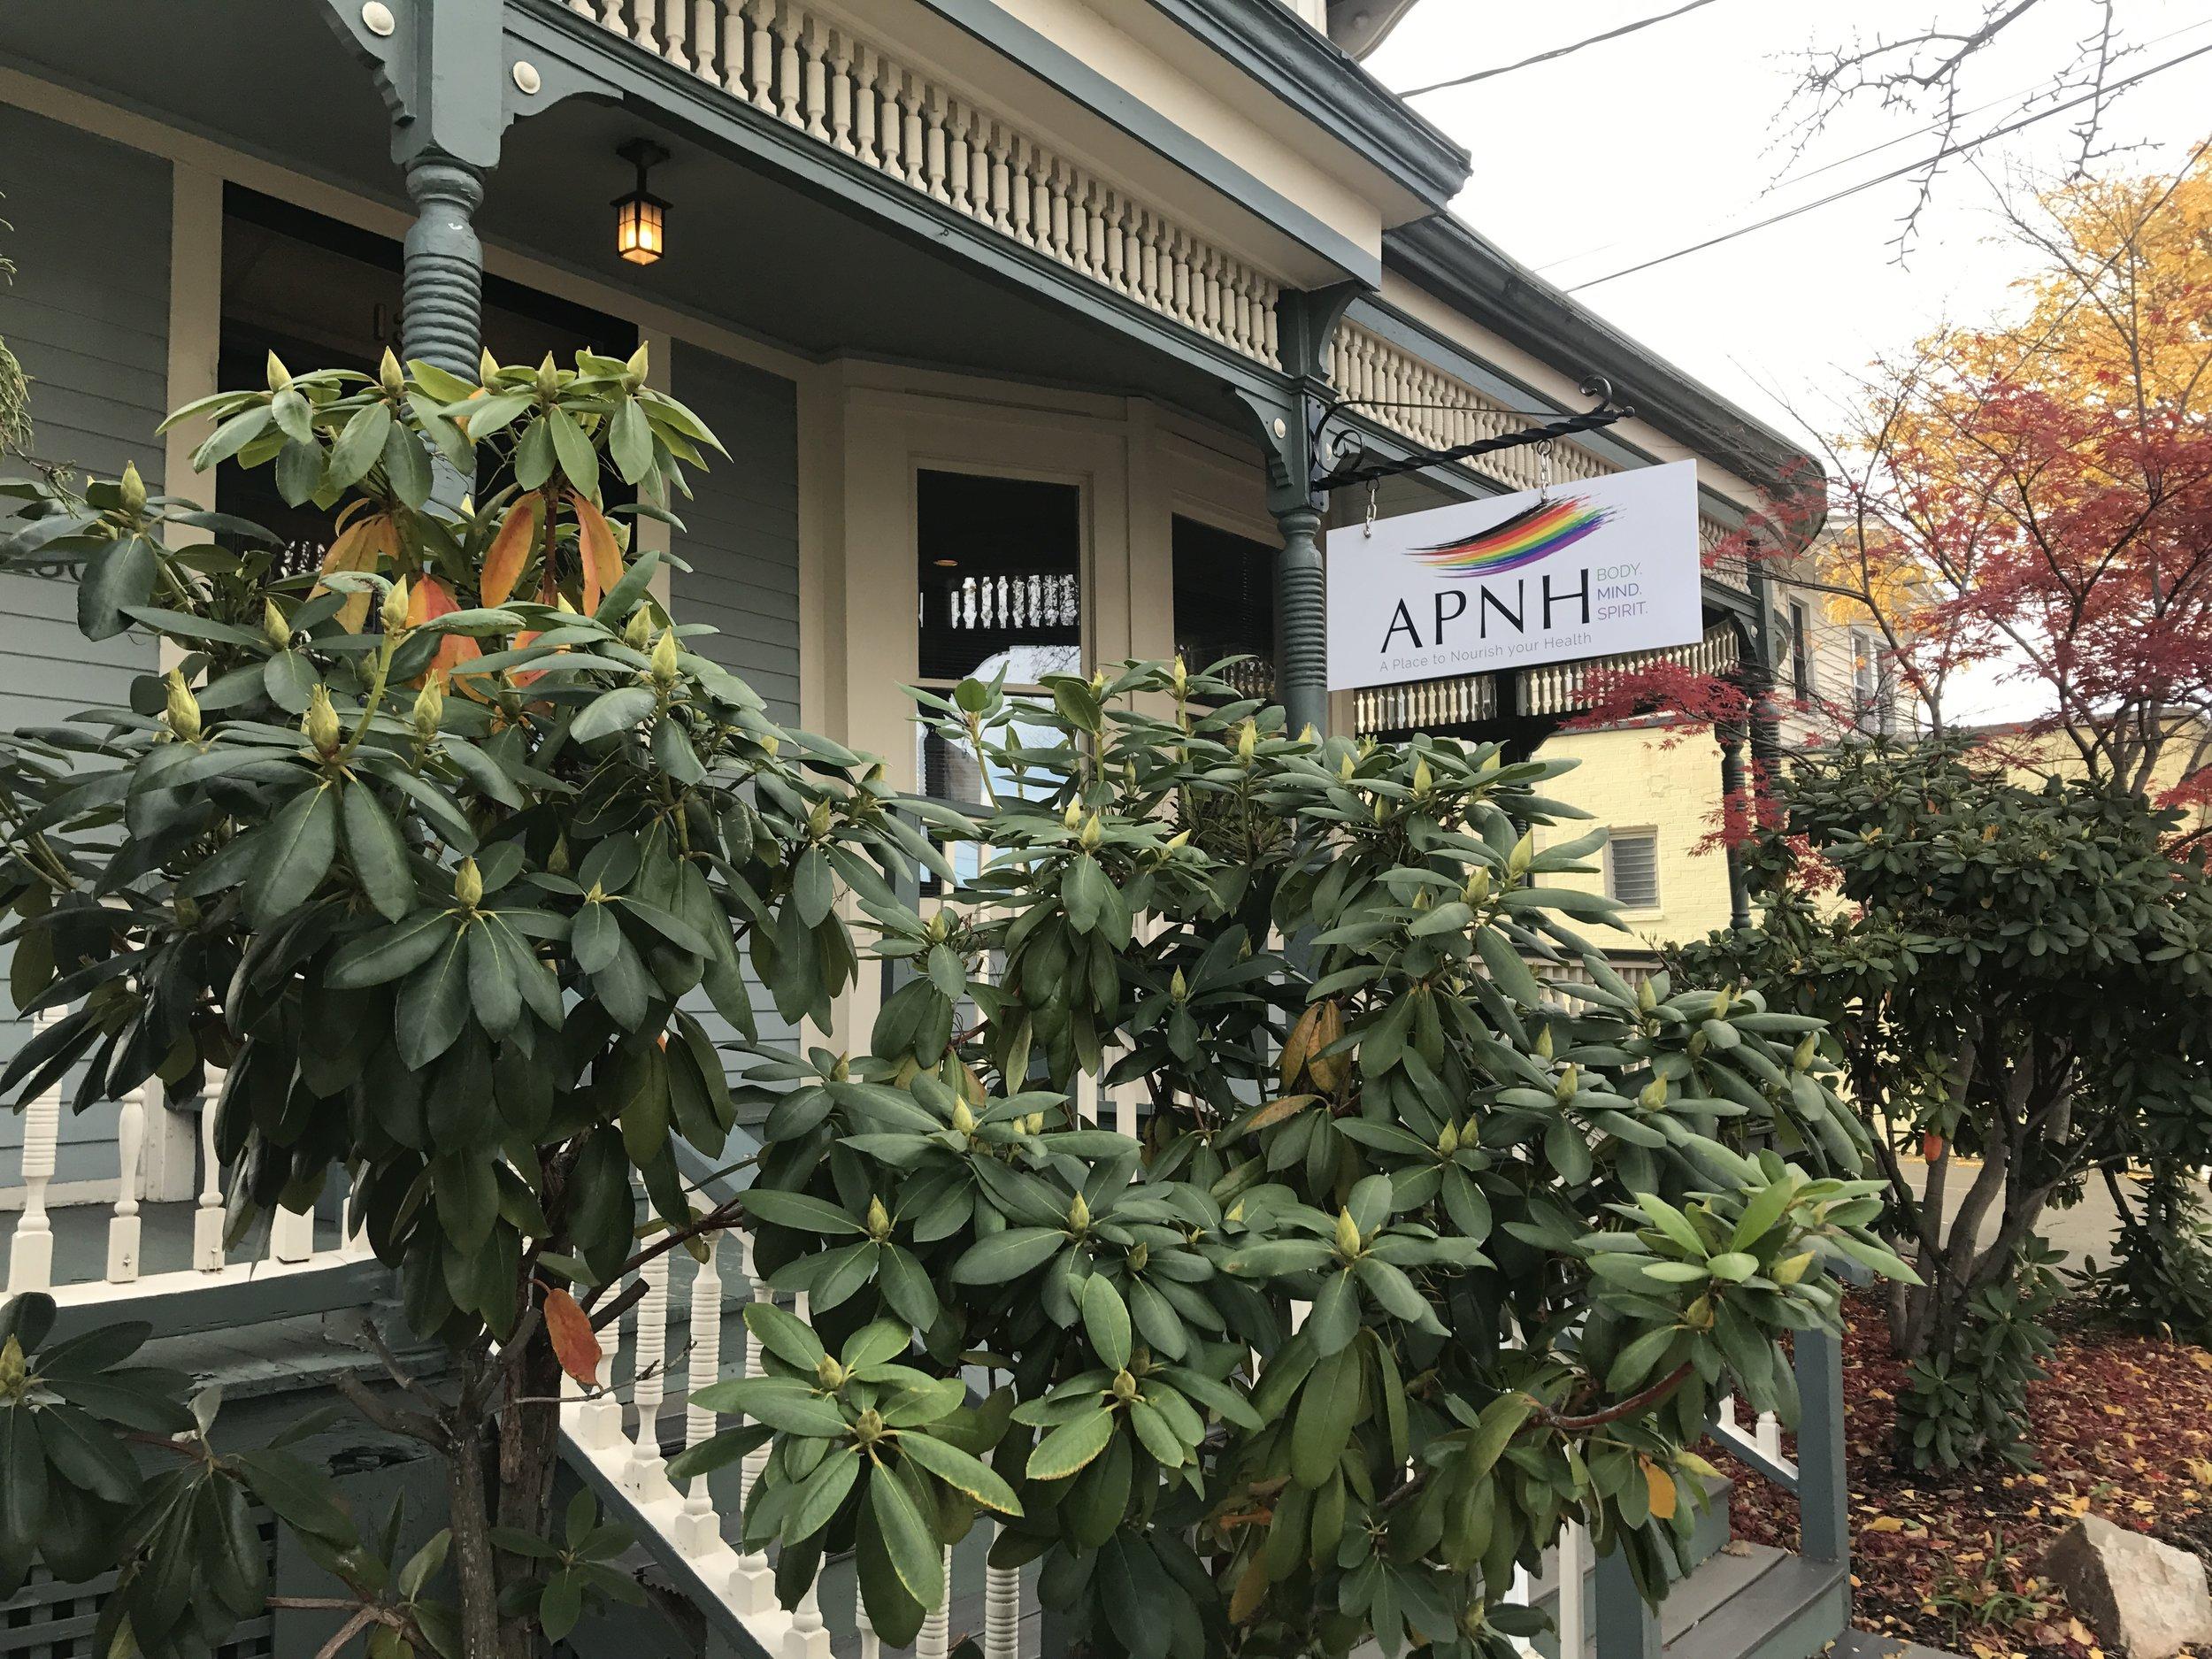 APNH 1302 Chapel Street (203) 624-0947